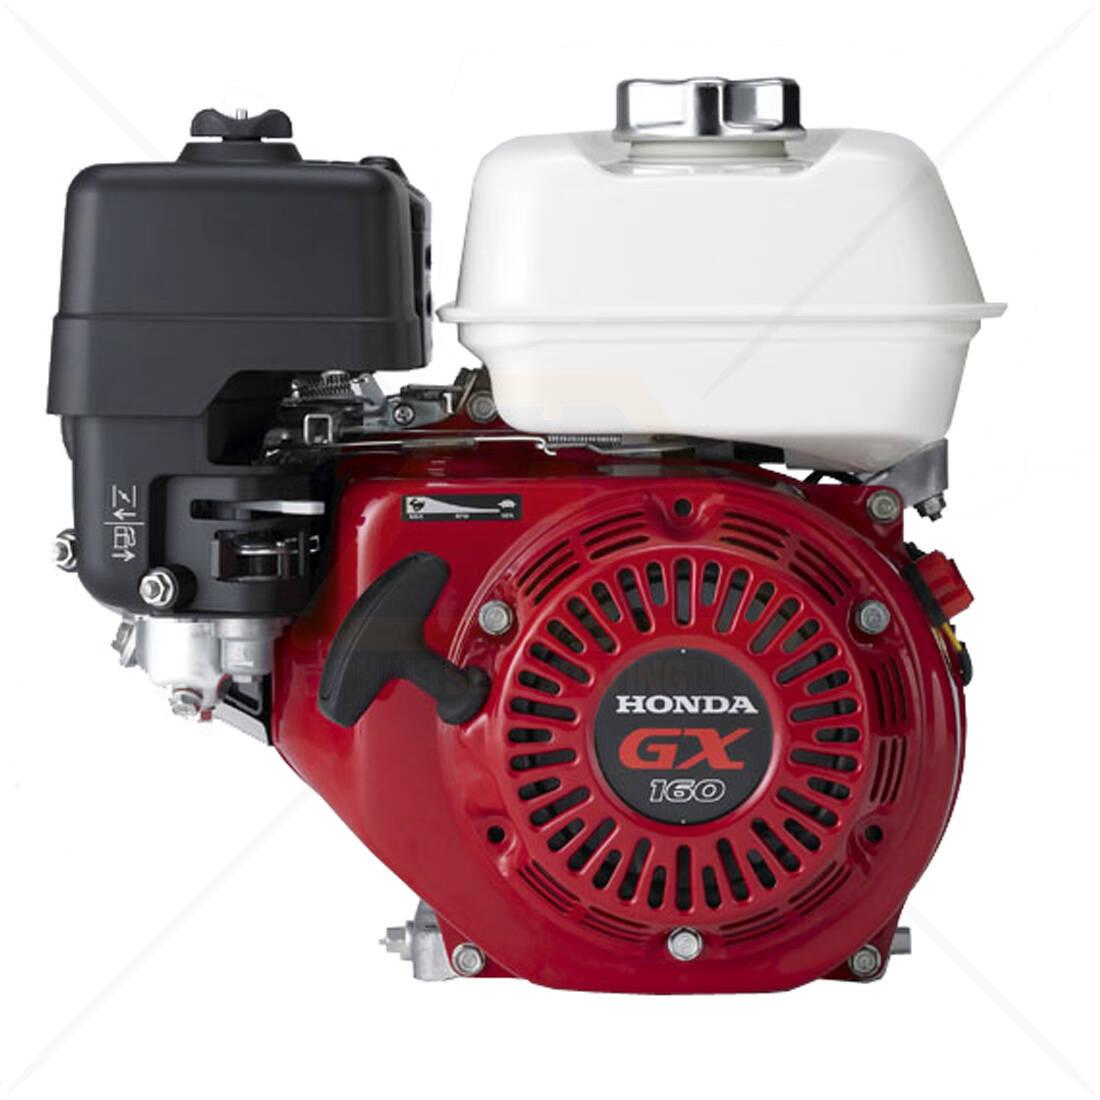 Honda Gx200 Carburetor Parts Diagram Gx160 Wiring Manual Motor Daily Instruction Guides U2022 Rh Testingwordpress Co Gx390 Breakdown